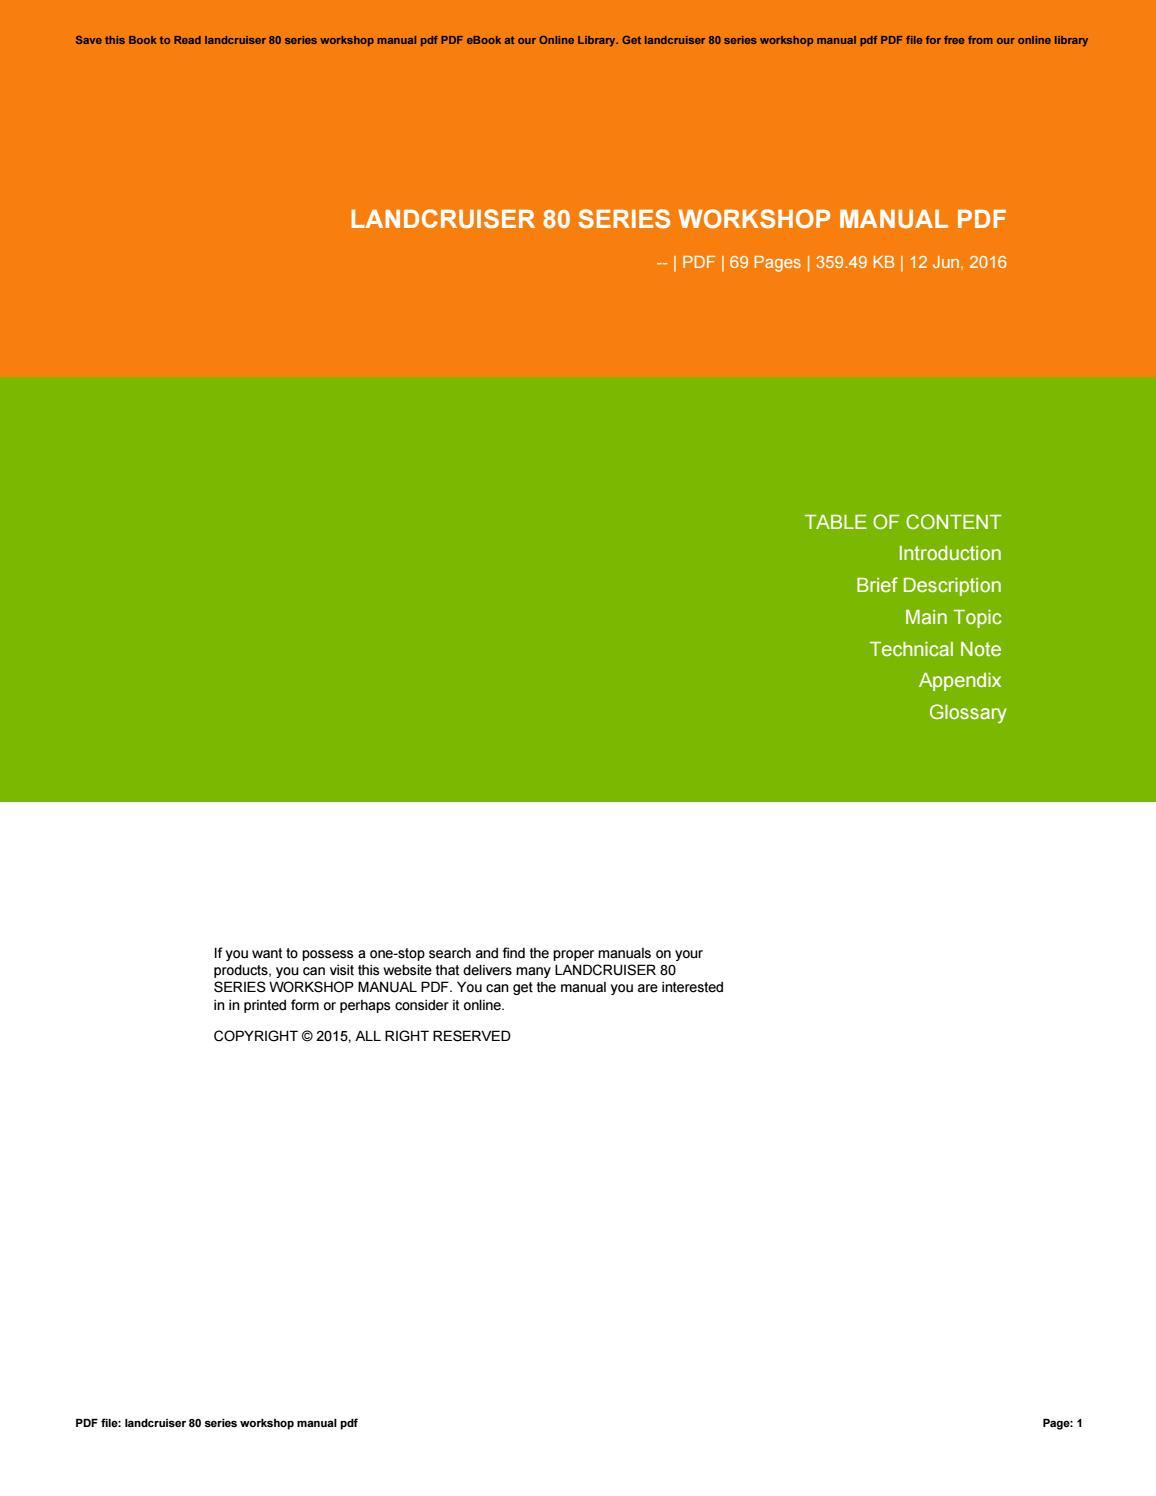 Landcruiser 80 series workshop manual pdf by tvchd46 issuu fandeluxe Gallery